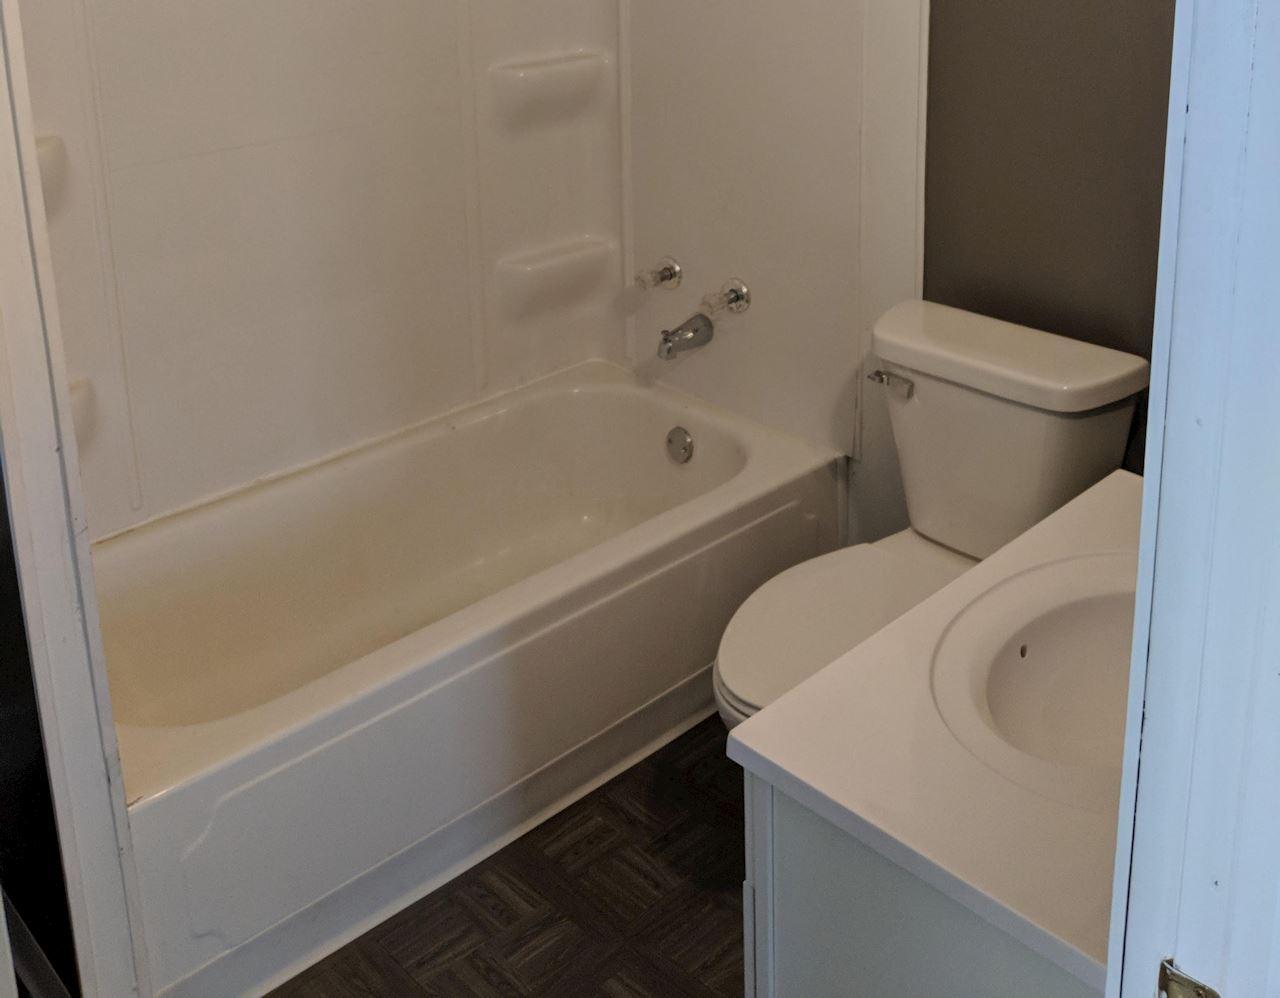 investment property - 142 Jackson St, Michigan City, IN 46360, La Porte - image 10